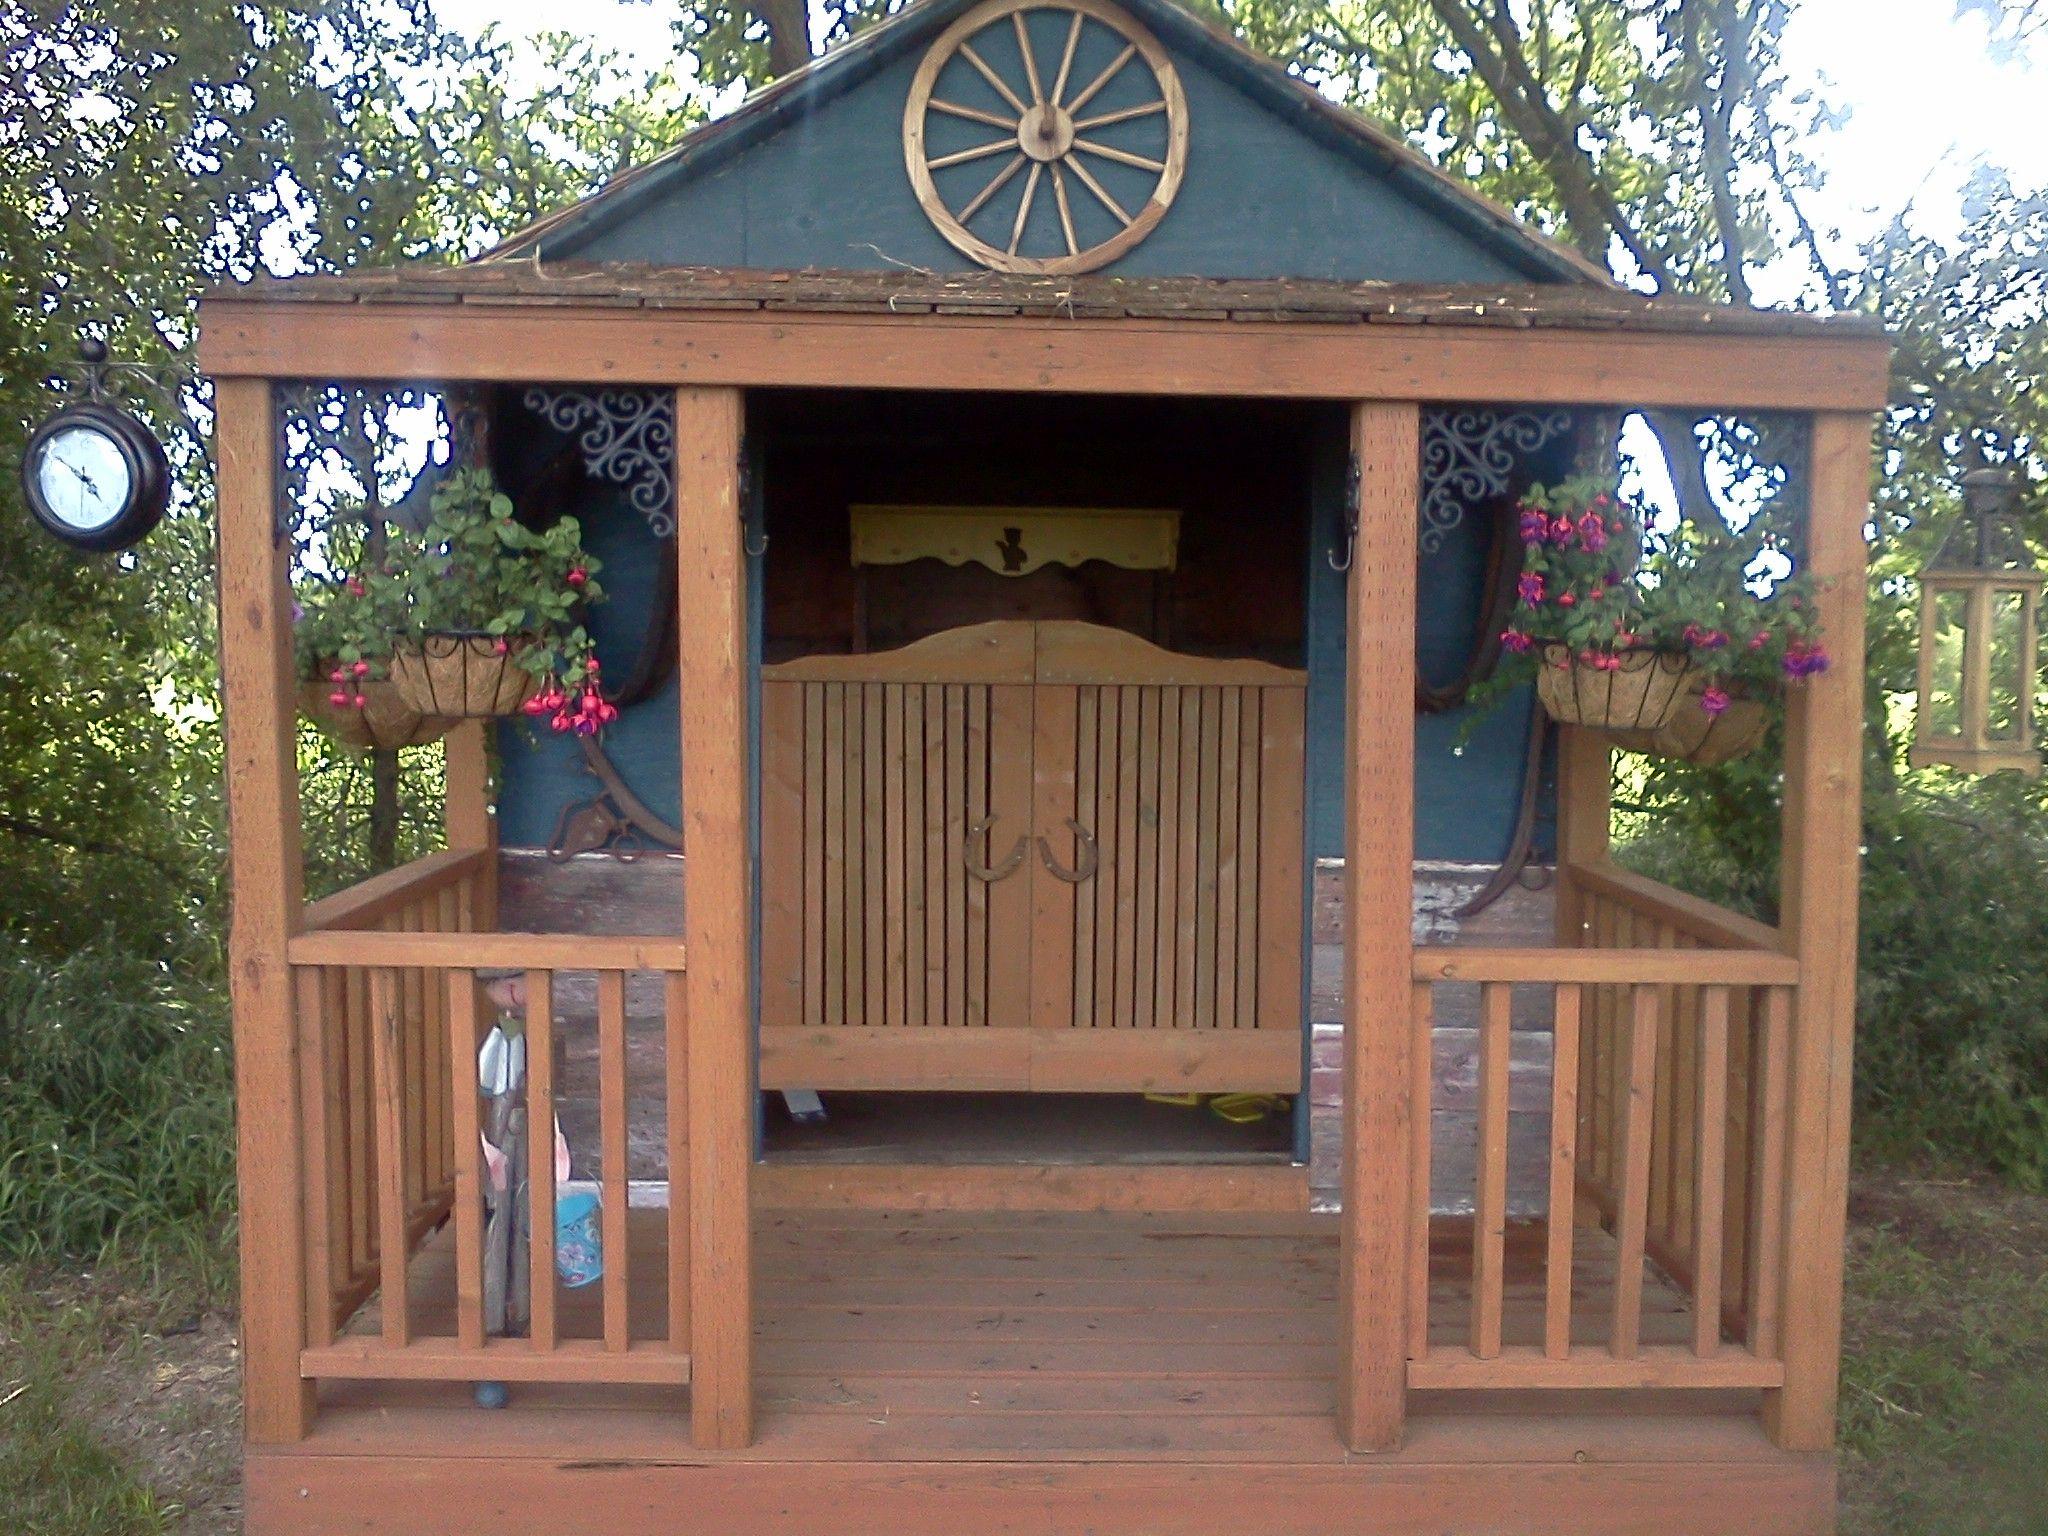 Cute Garden Shed With Saloon Doors Cute Little Garden